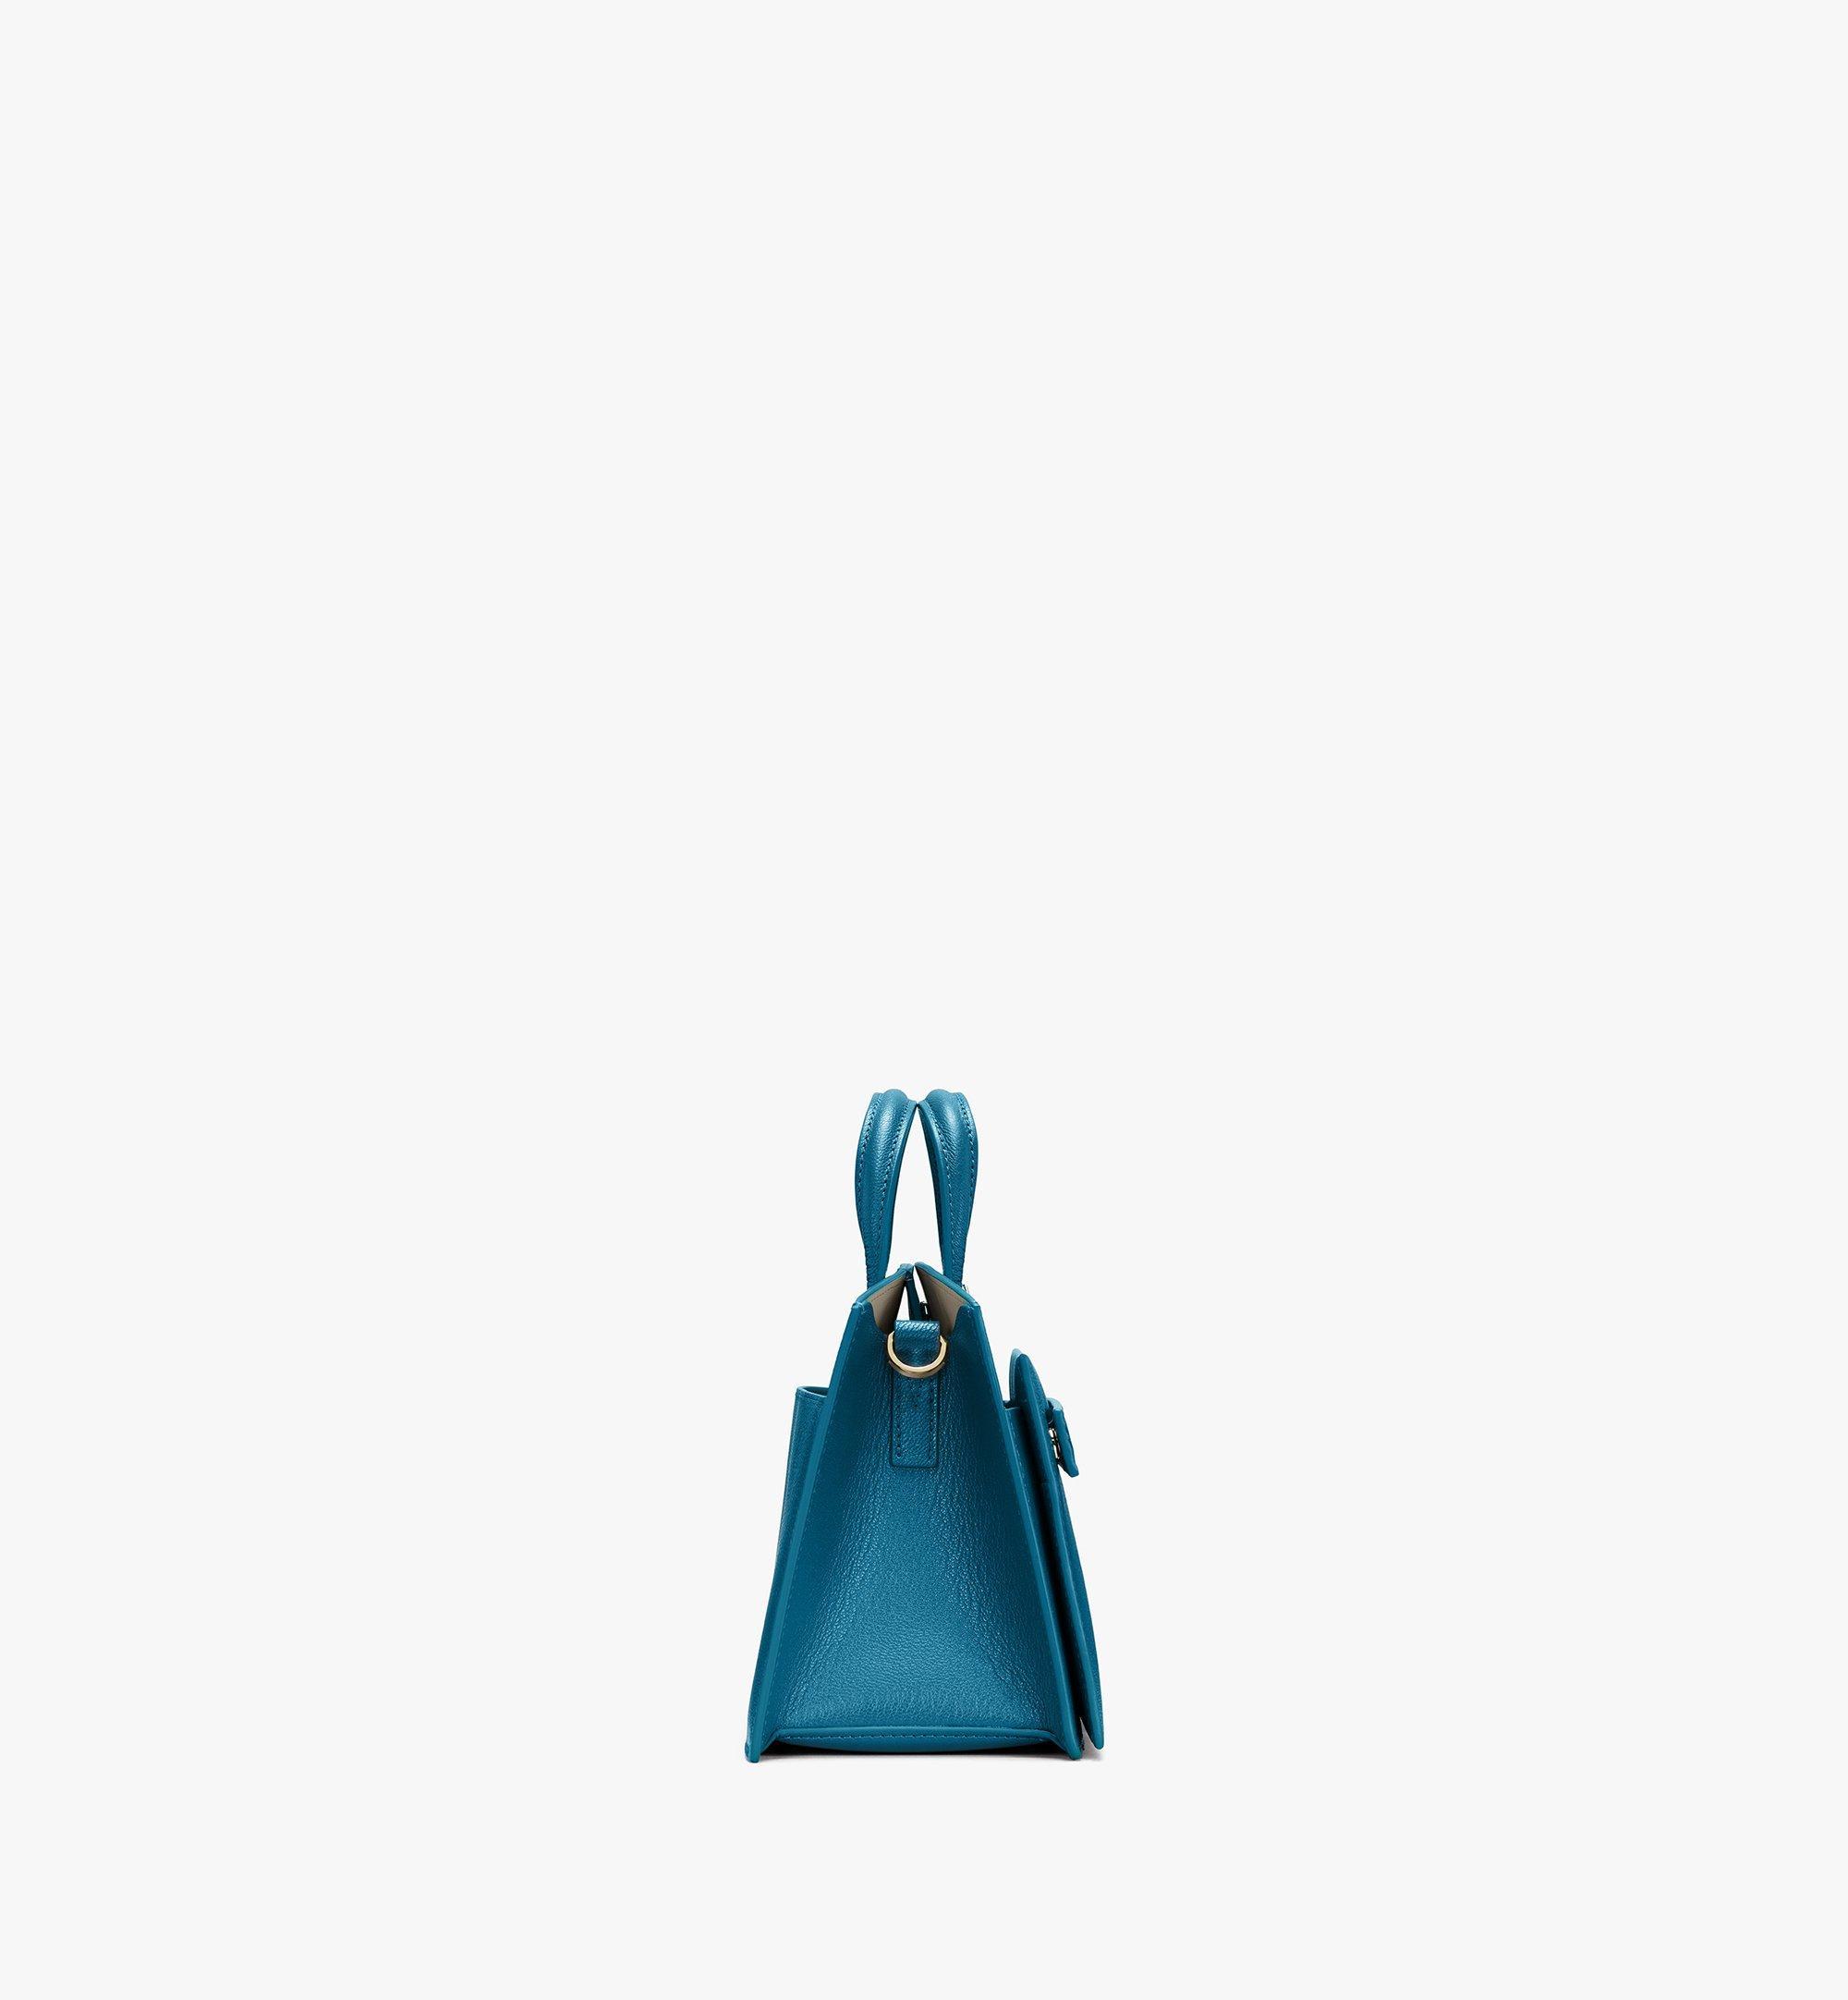 MCM Milano Tote Bag in Goatskin Leather Blue MWTASDA04JF001 Alternate View 2